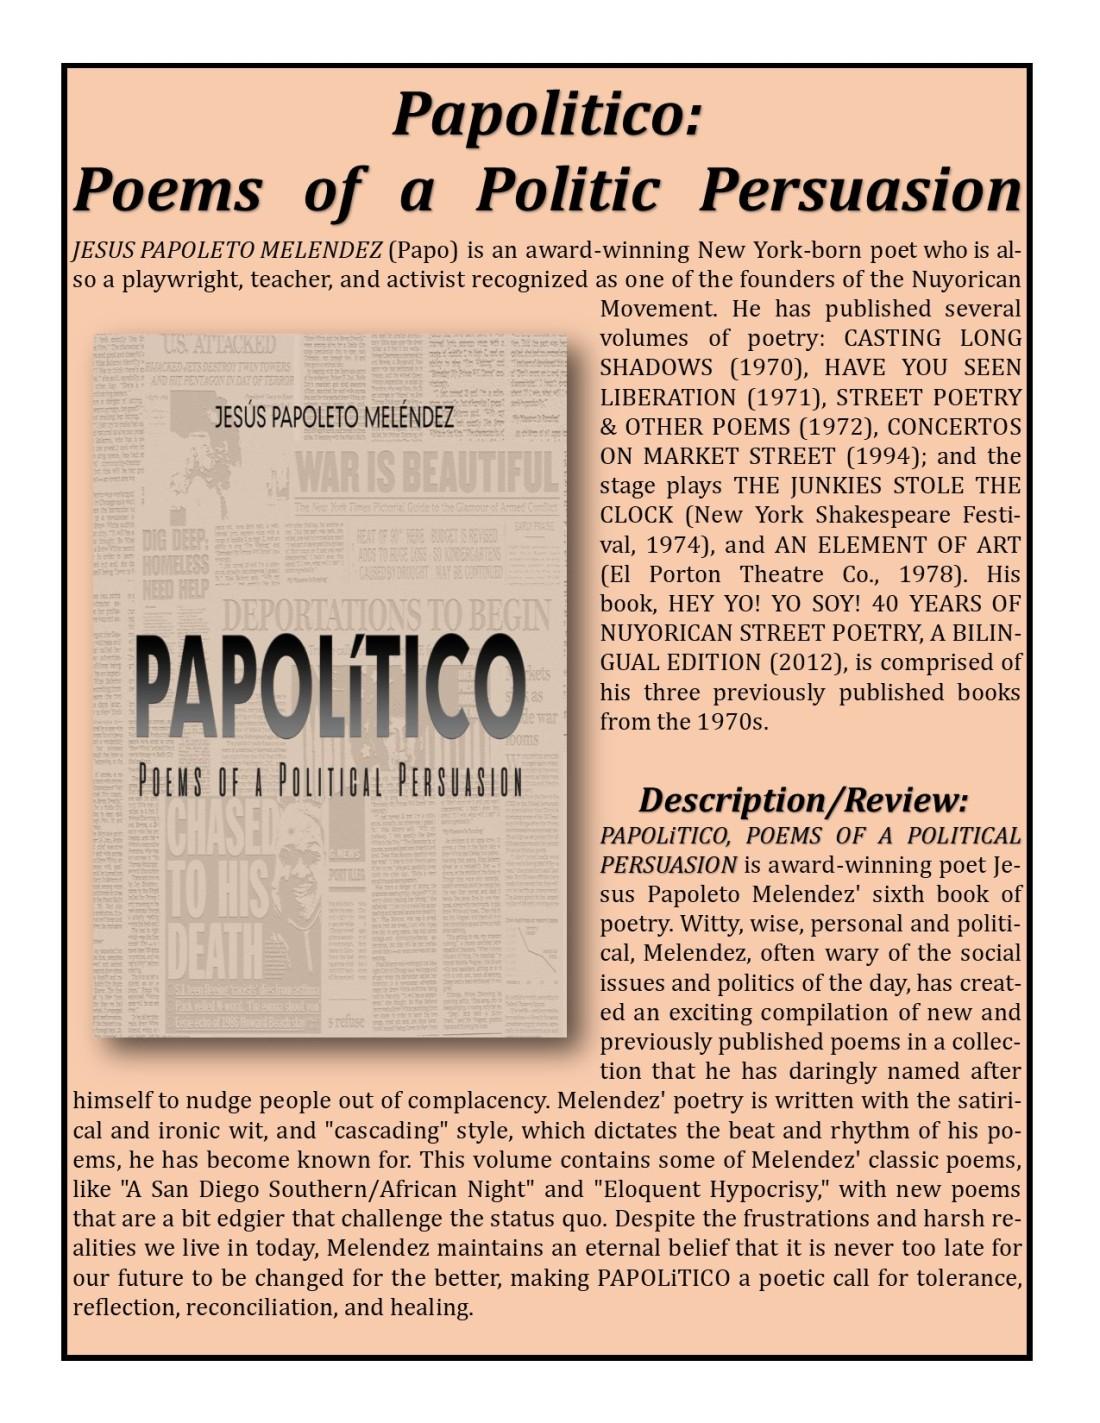 Book by Jesus Papoleto Melendez 2jpeg